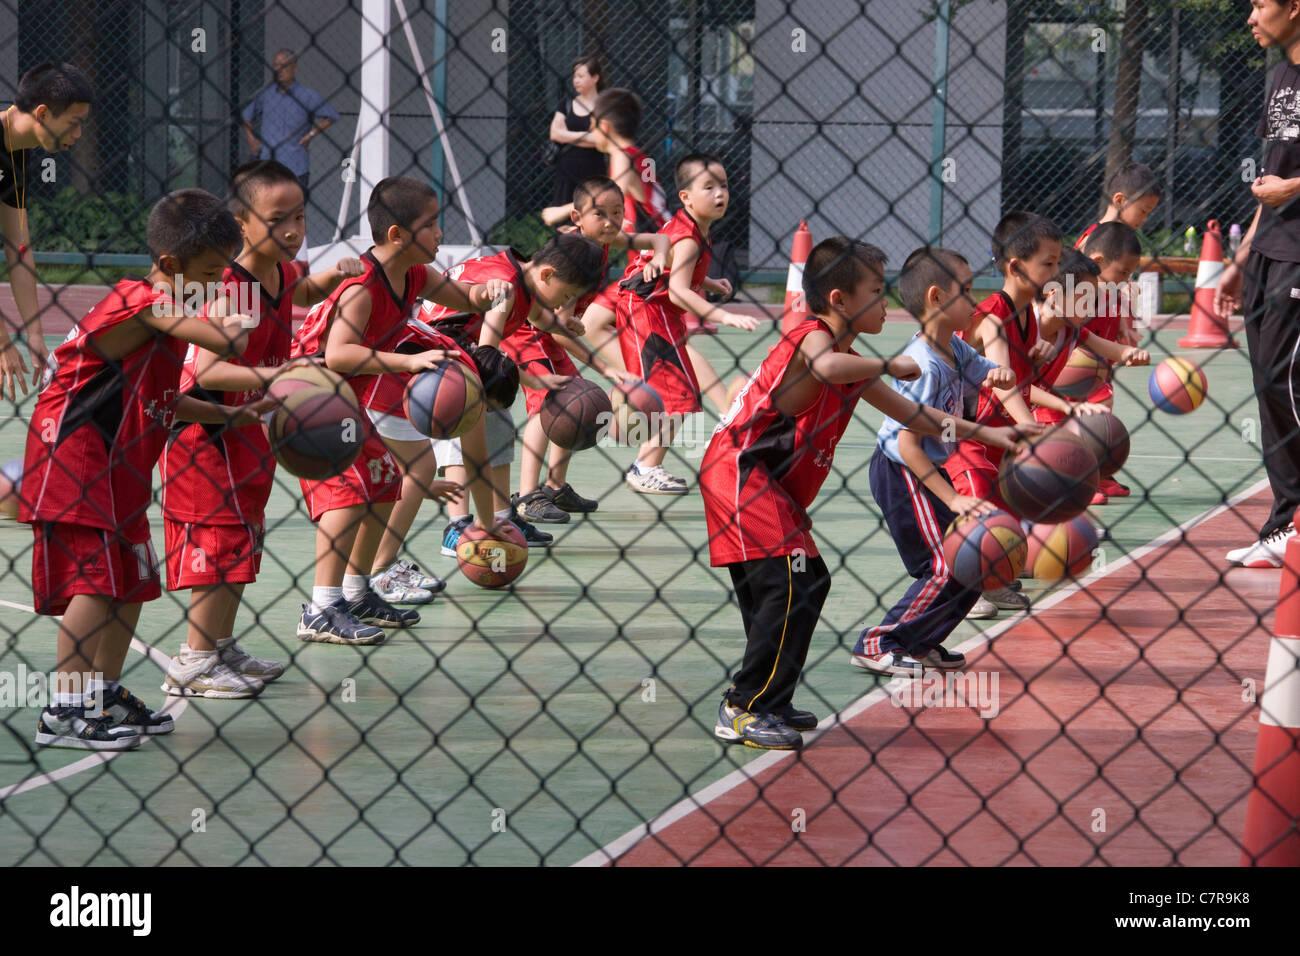 Children playing basketball at school, Guangzhou, Guangdong, China - Stock Image